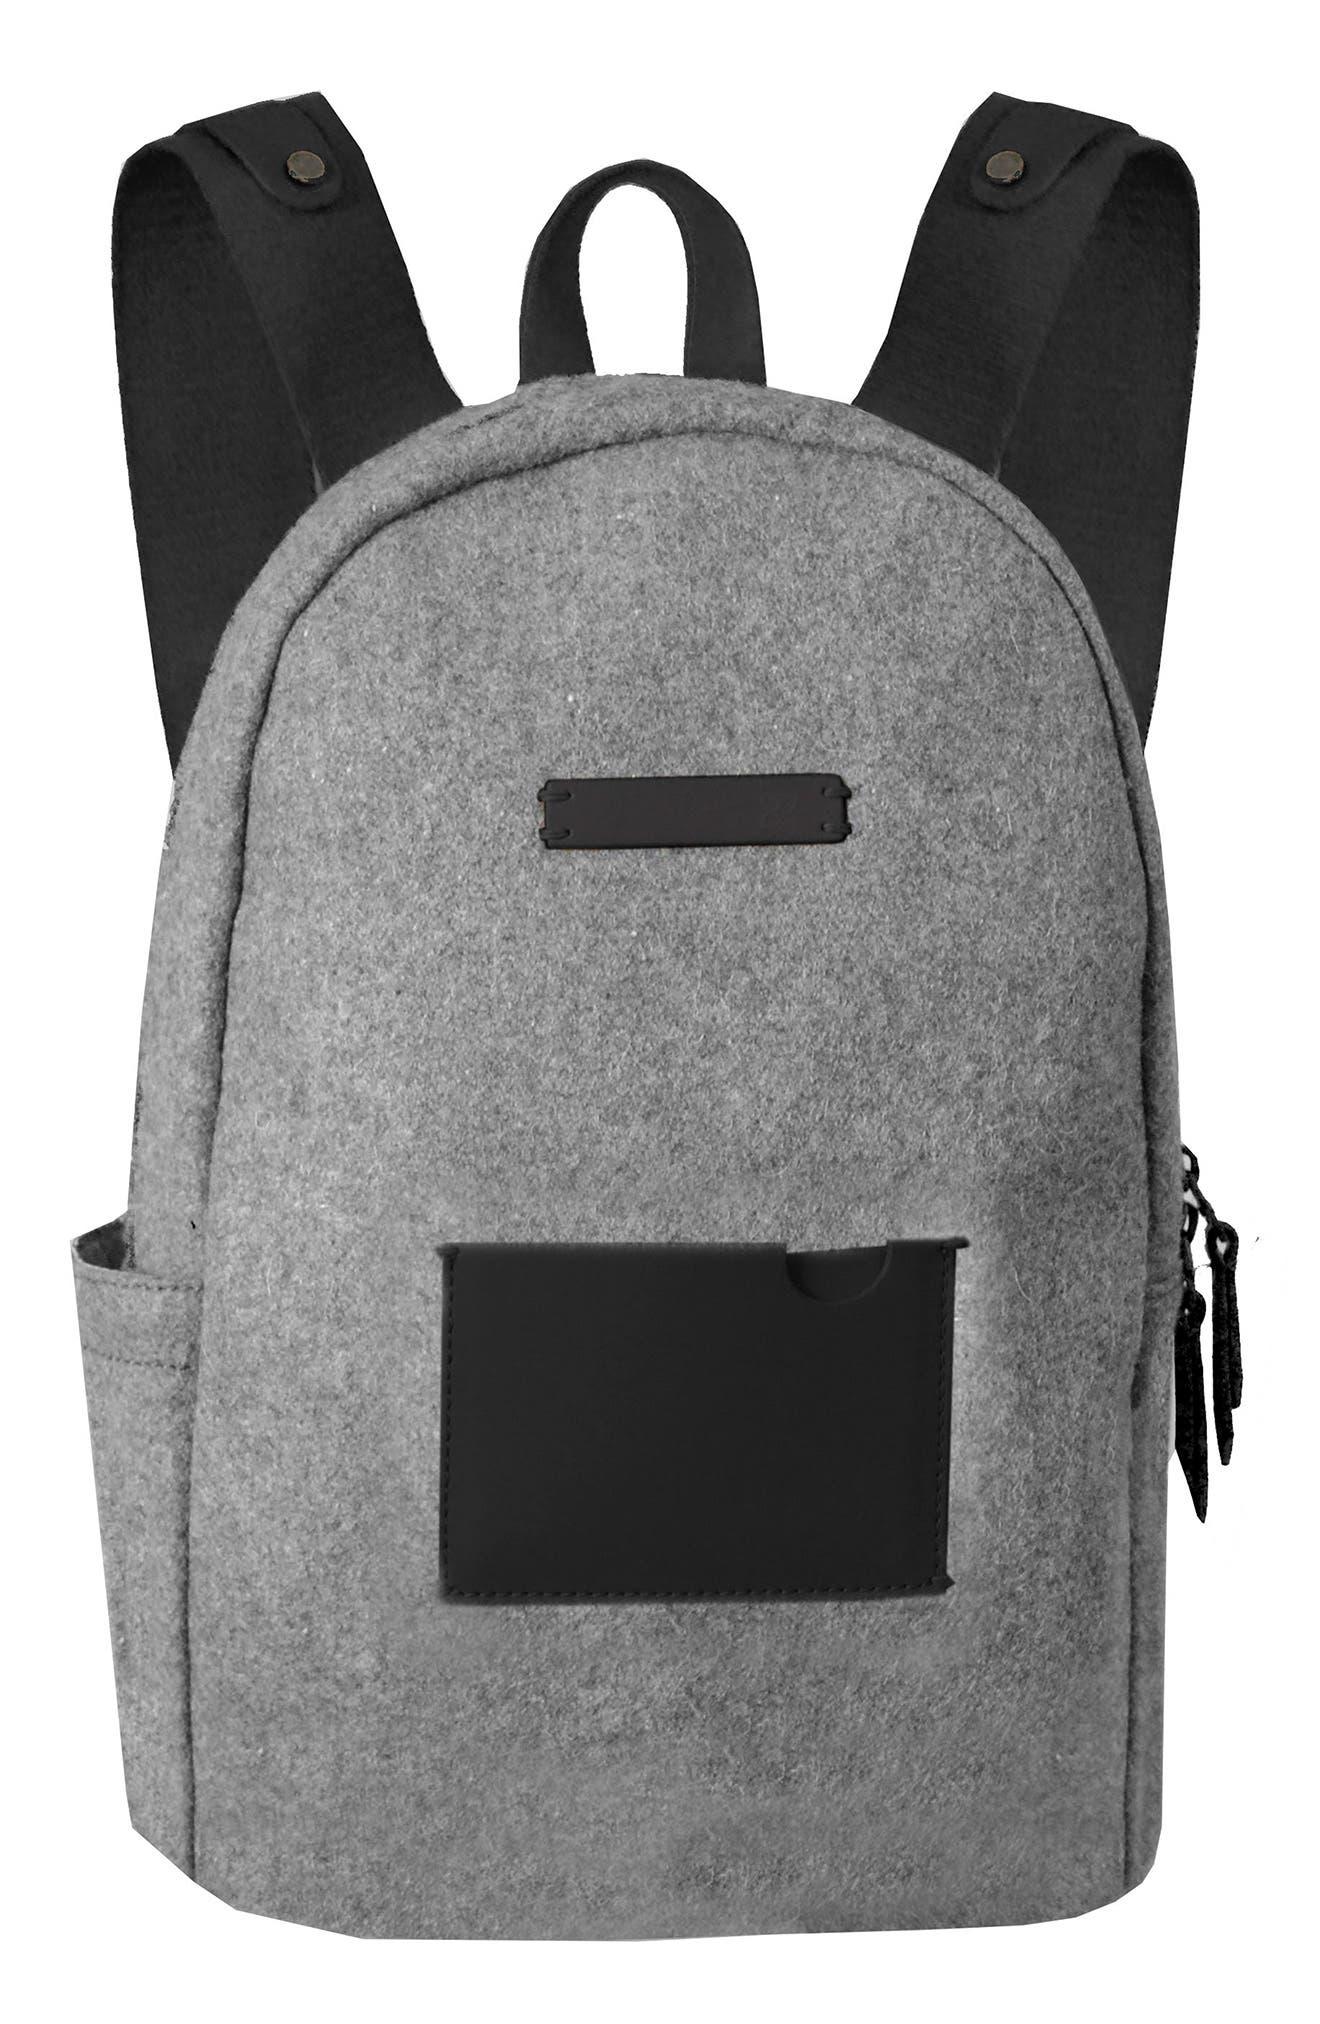 Indie Boiled Wool Backpack,                             Main thumbnail 2, color,